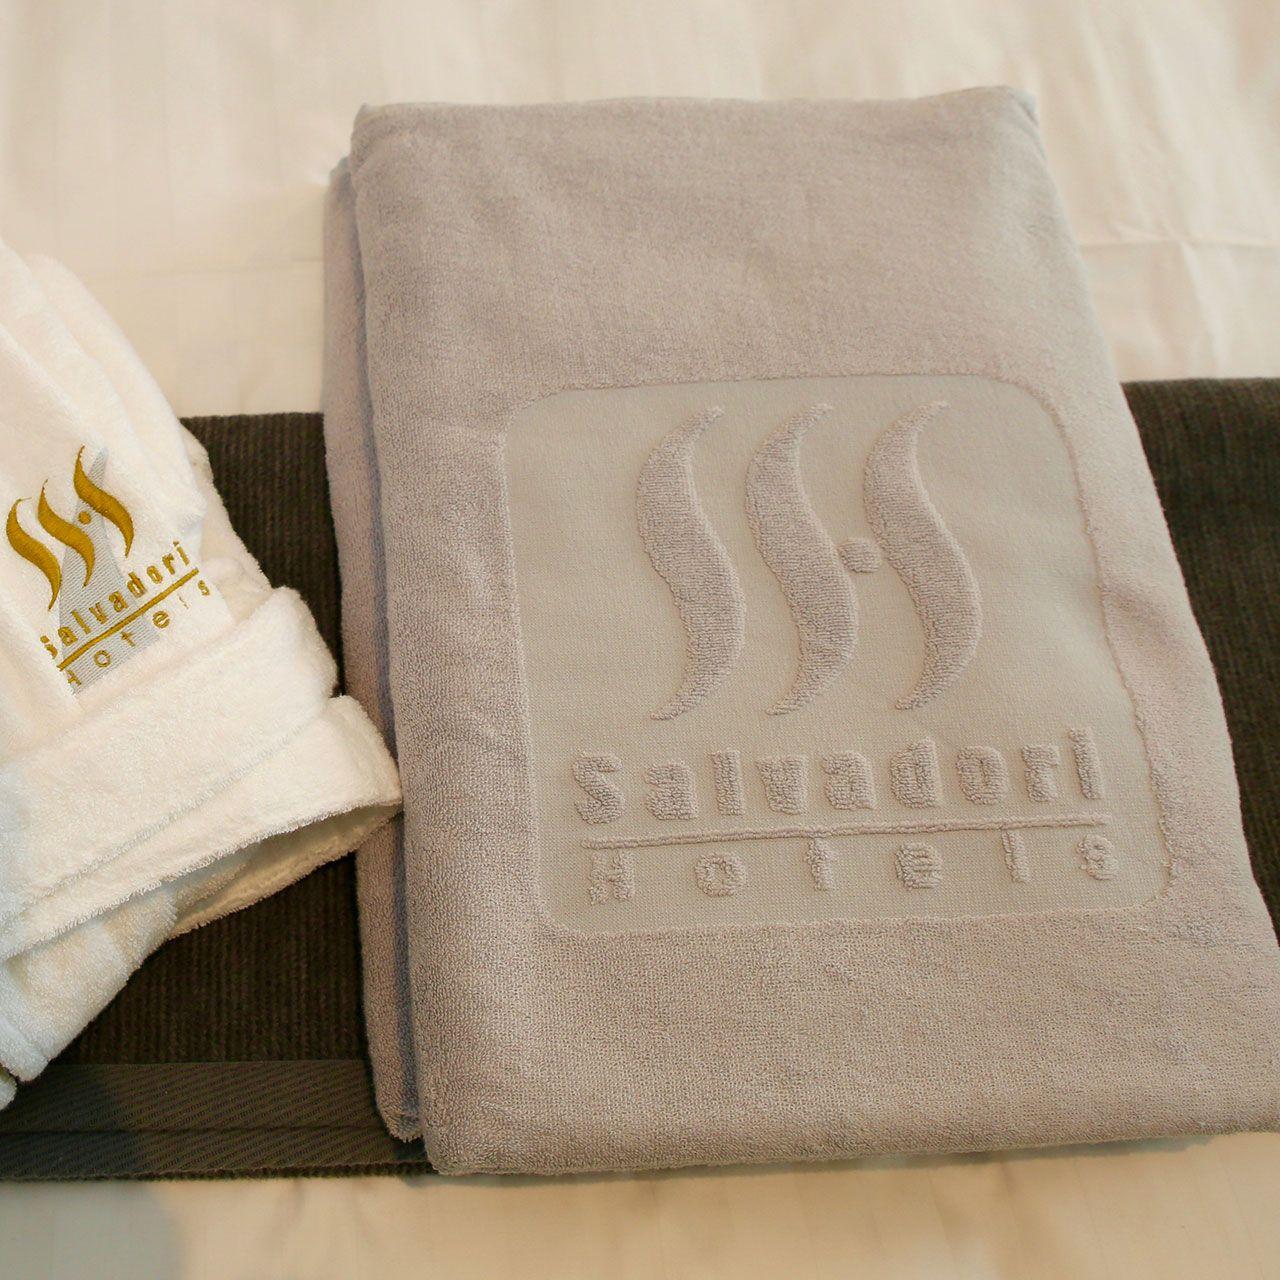 Firm Hotel Griffe Lignano Sabbiadoro